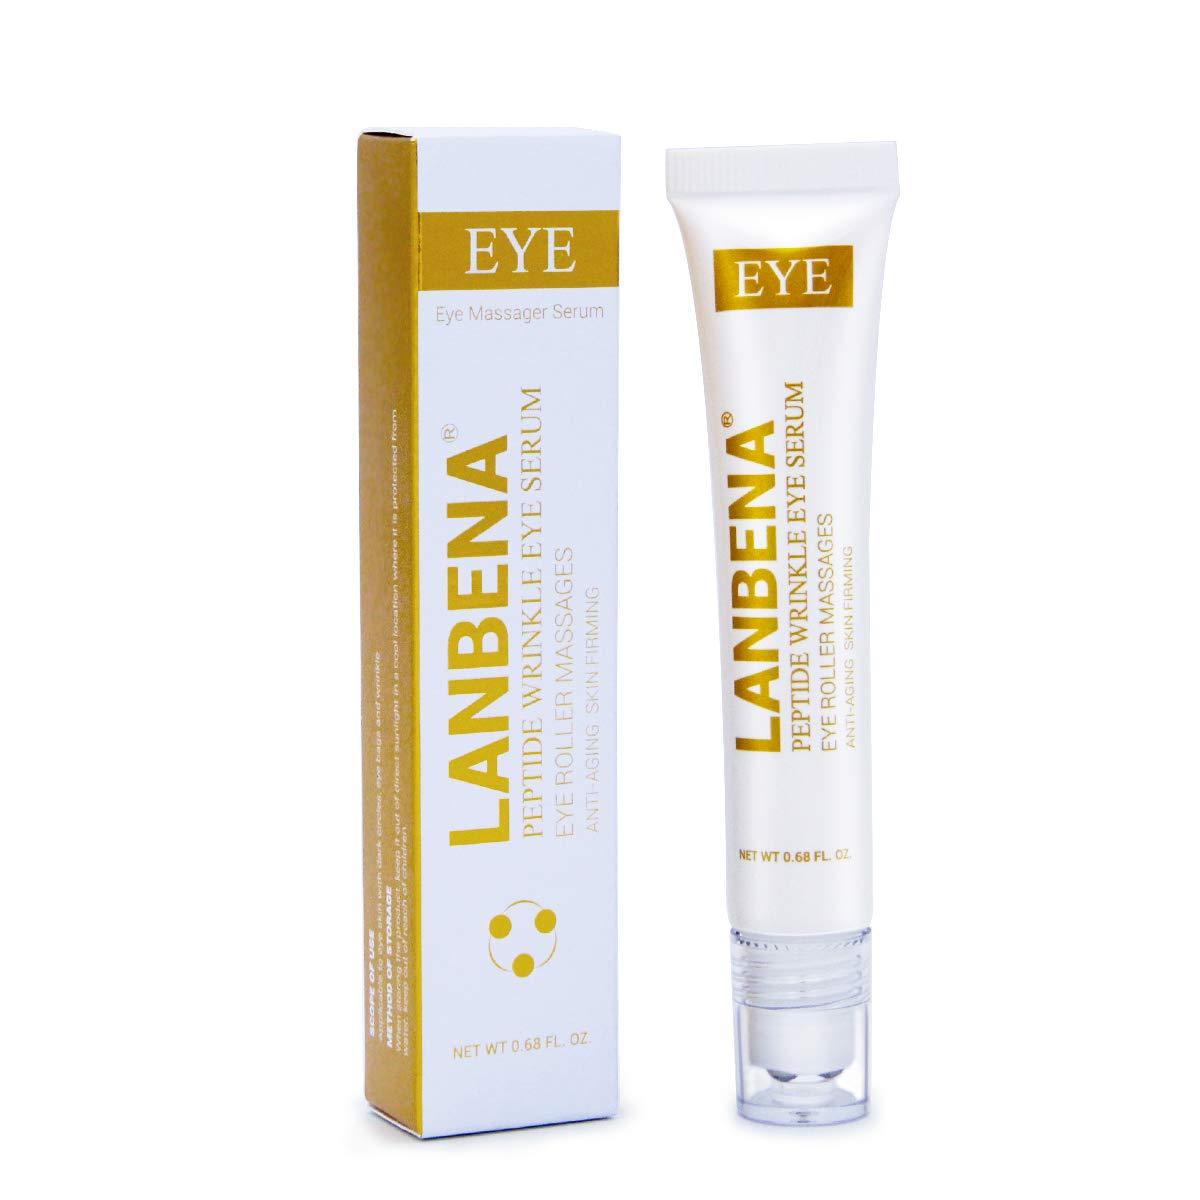 Wrinkle and dark circle eye cream,LKE Puffiness Treatments Dark circles under eye treatment anti aging moisturizer skin care tools